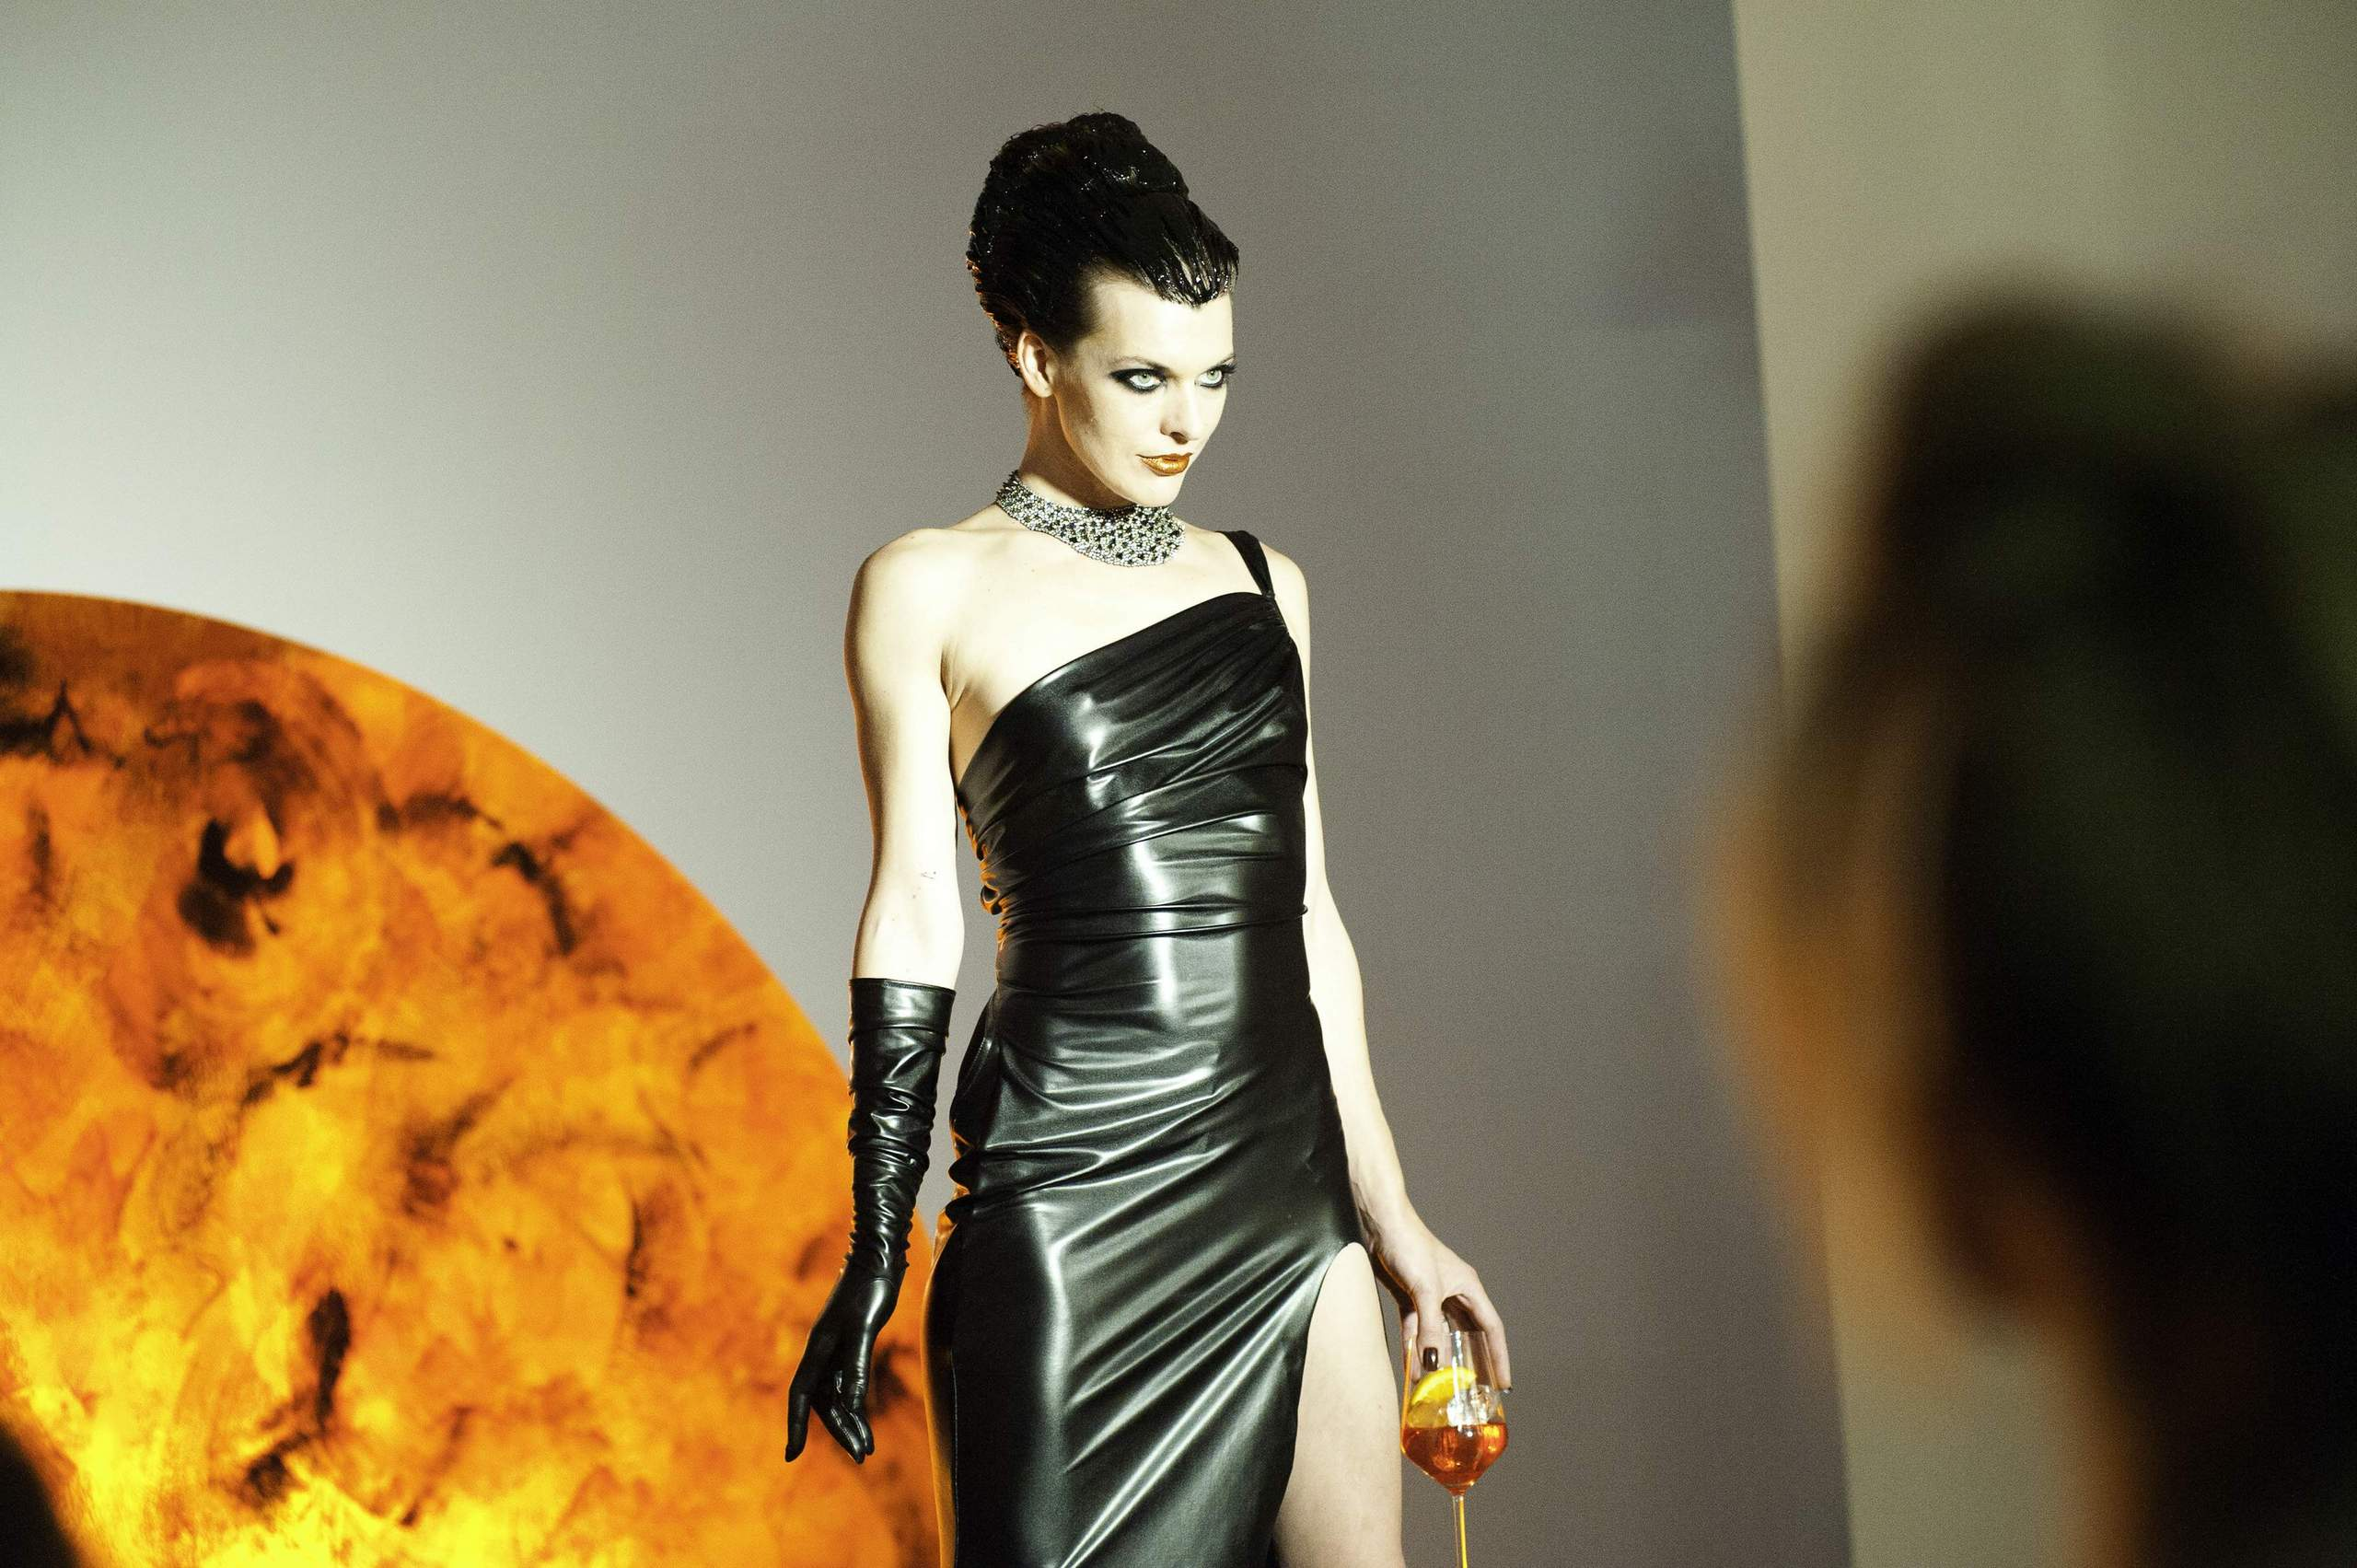 Campari Calendar Photoshoot - Behind the Scenes